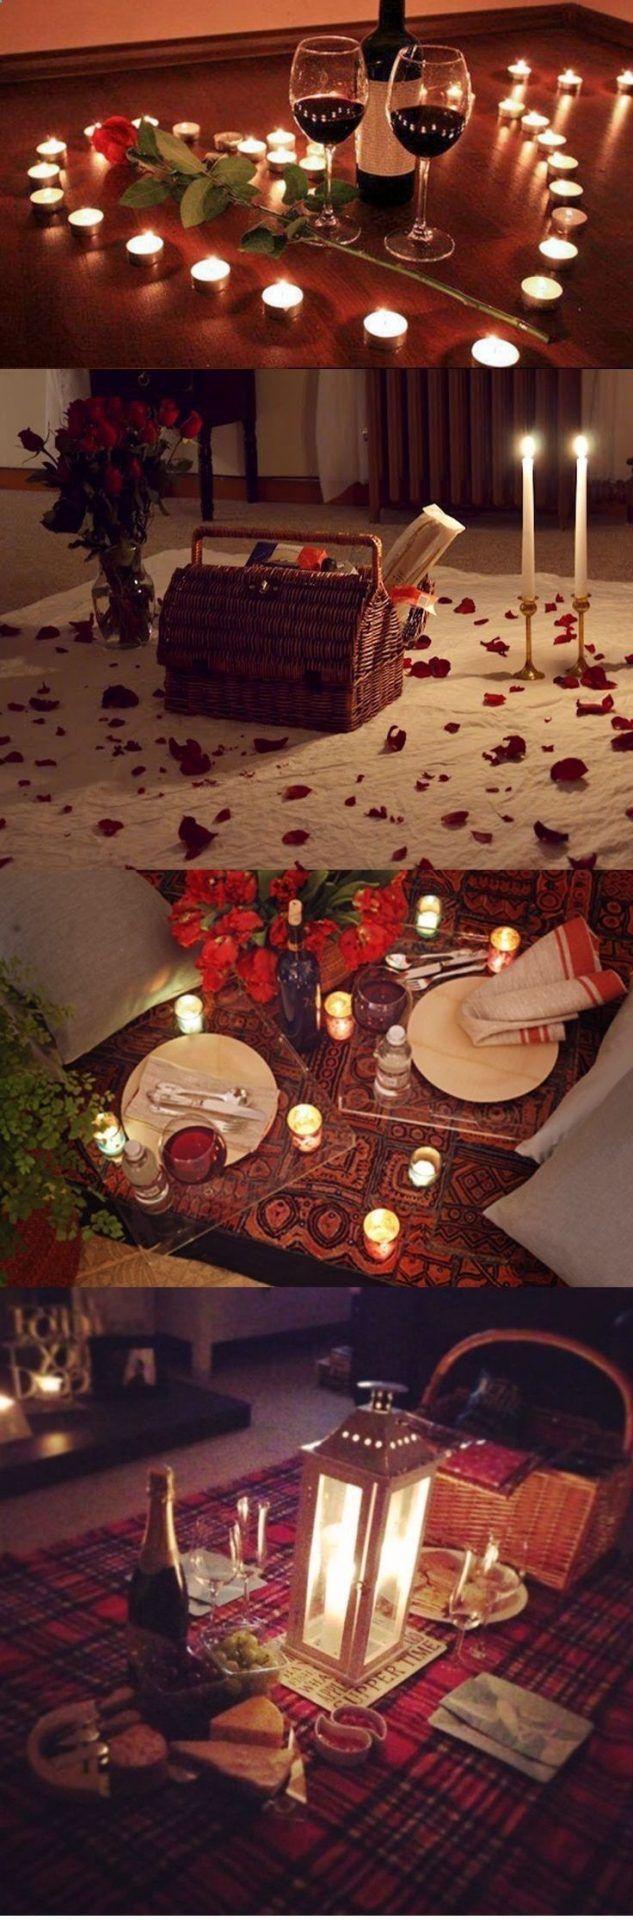 Romantic Bedroom Ideas (Essentials & Best Colour) - The Good Luck Duck